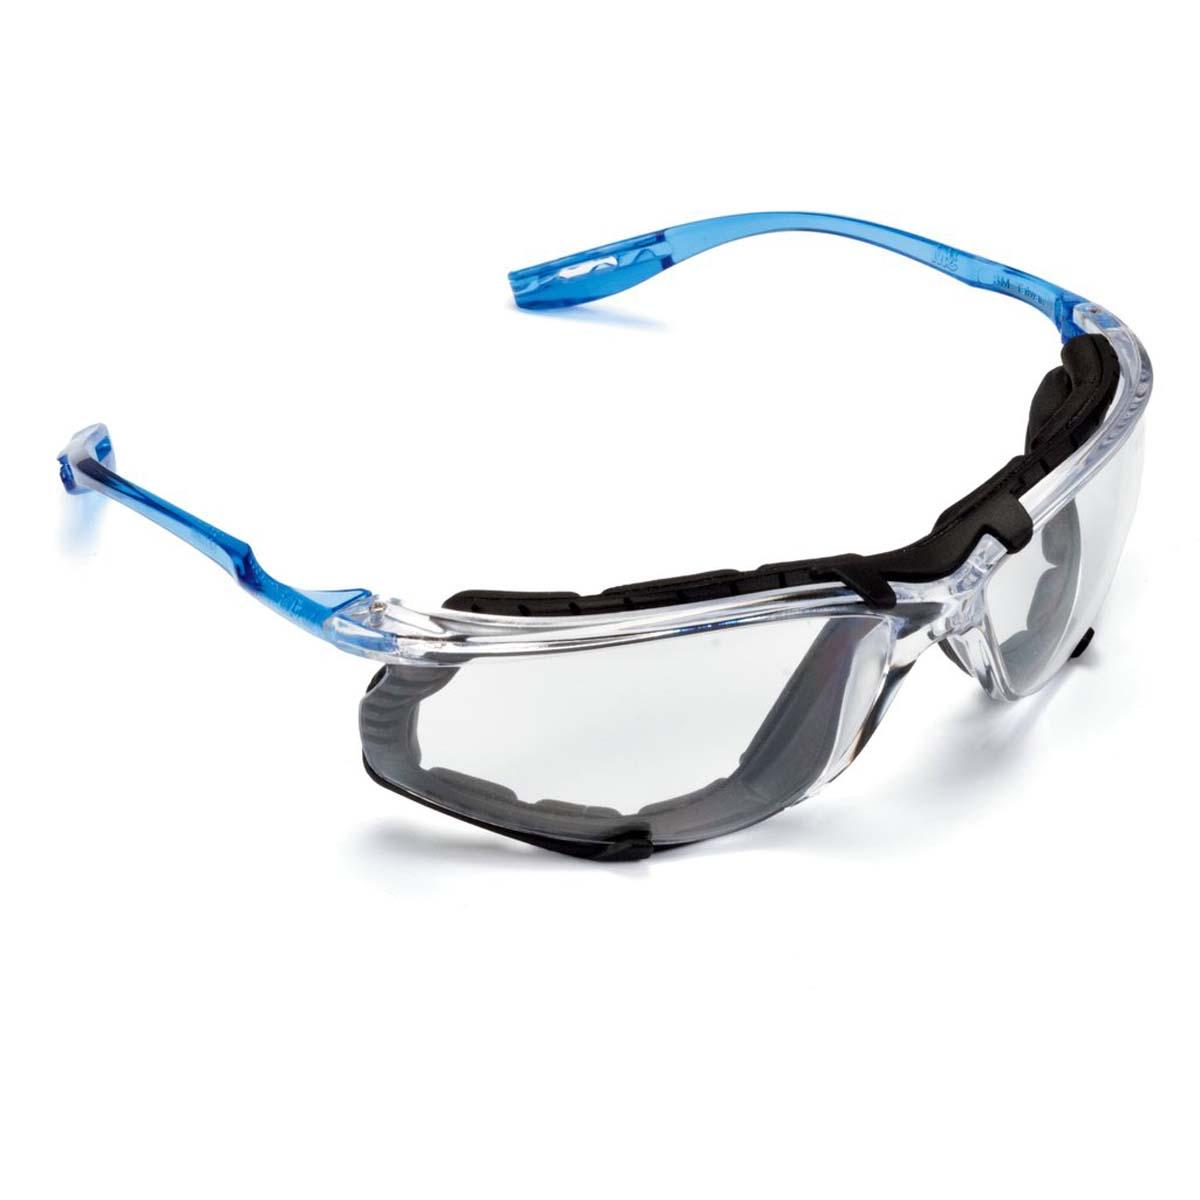 "3Mâ""¢ Virtuaâ""¢ CCS Protective Eyewear 11872-00000-20, with Foam Gasket, CLEAR Anti-Fog Lens,"